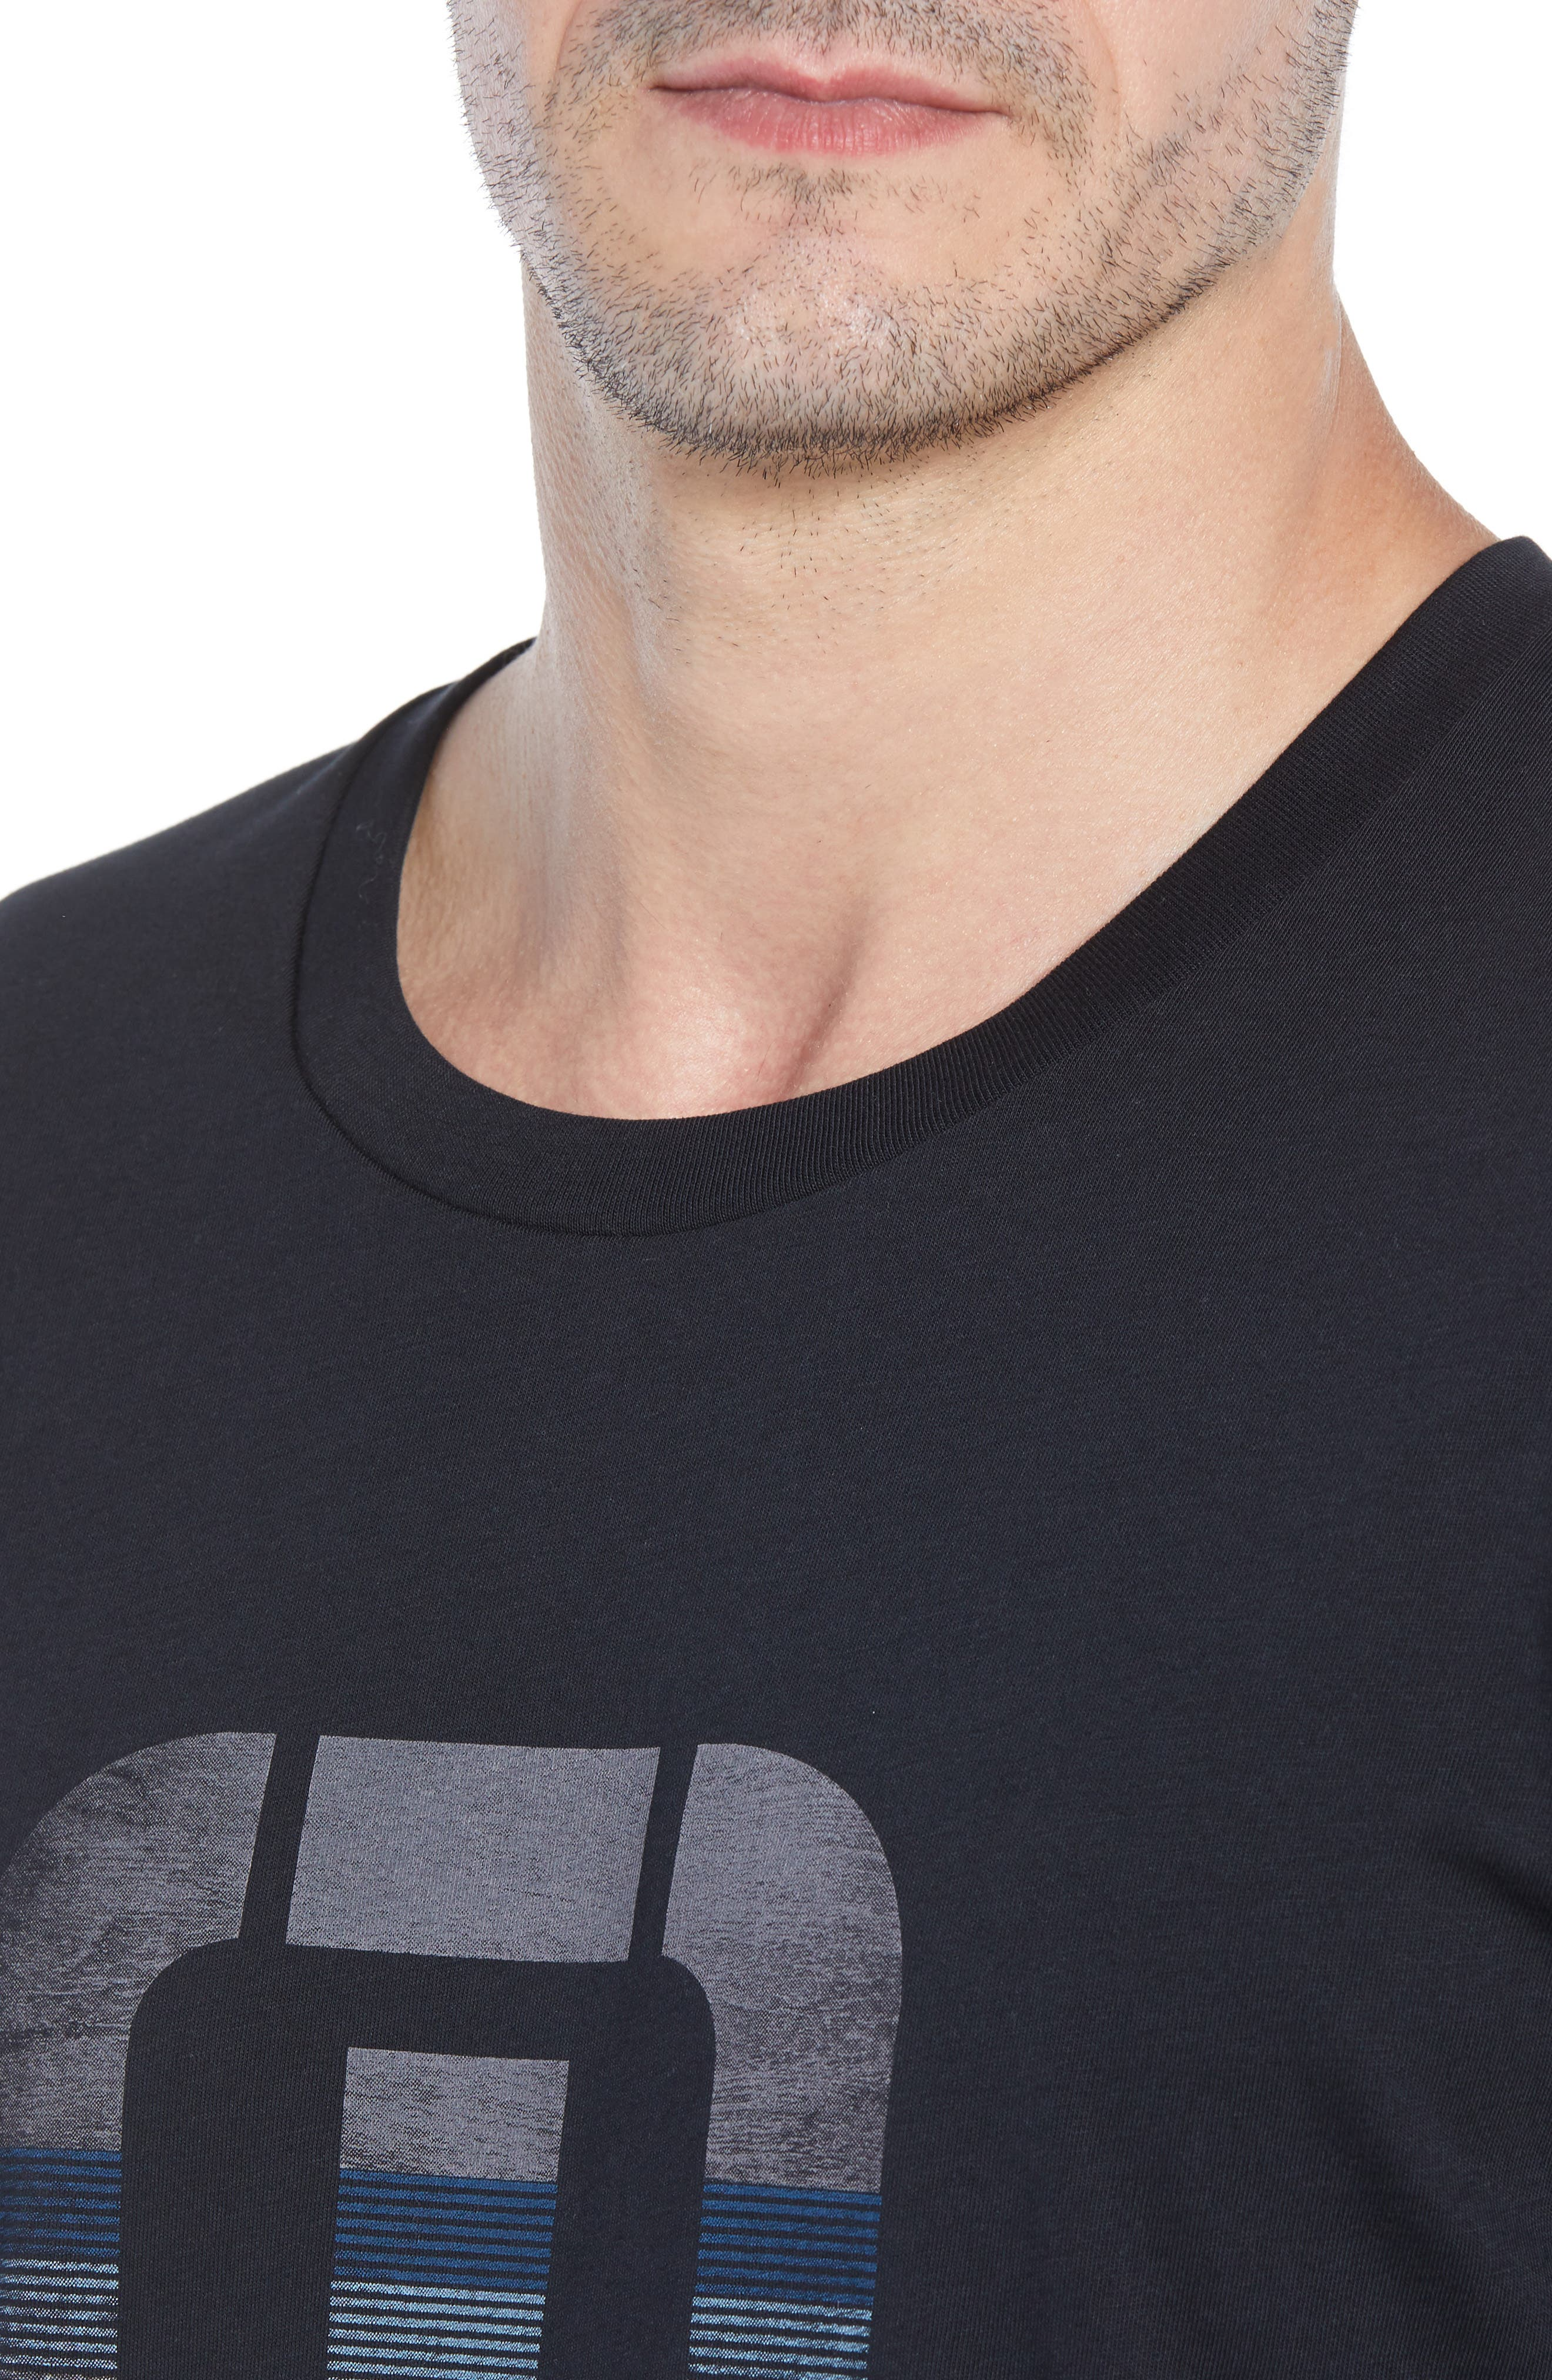 Rock City Crewneck T-Shirt,                             Alternate thumbnail 4, color,                             BLACK